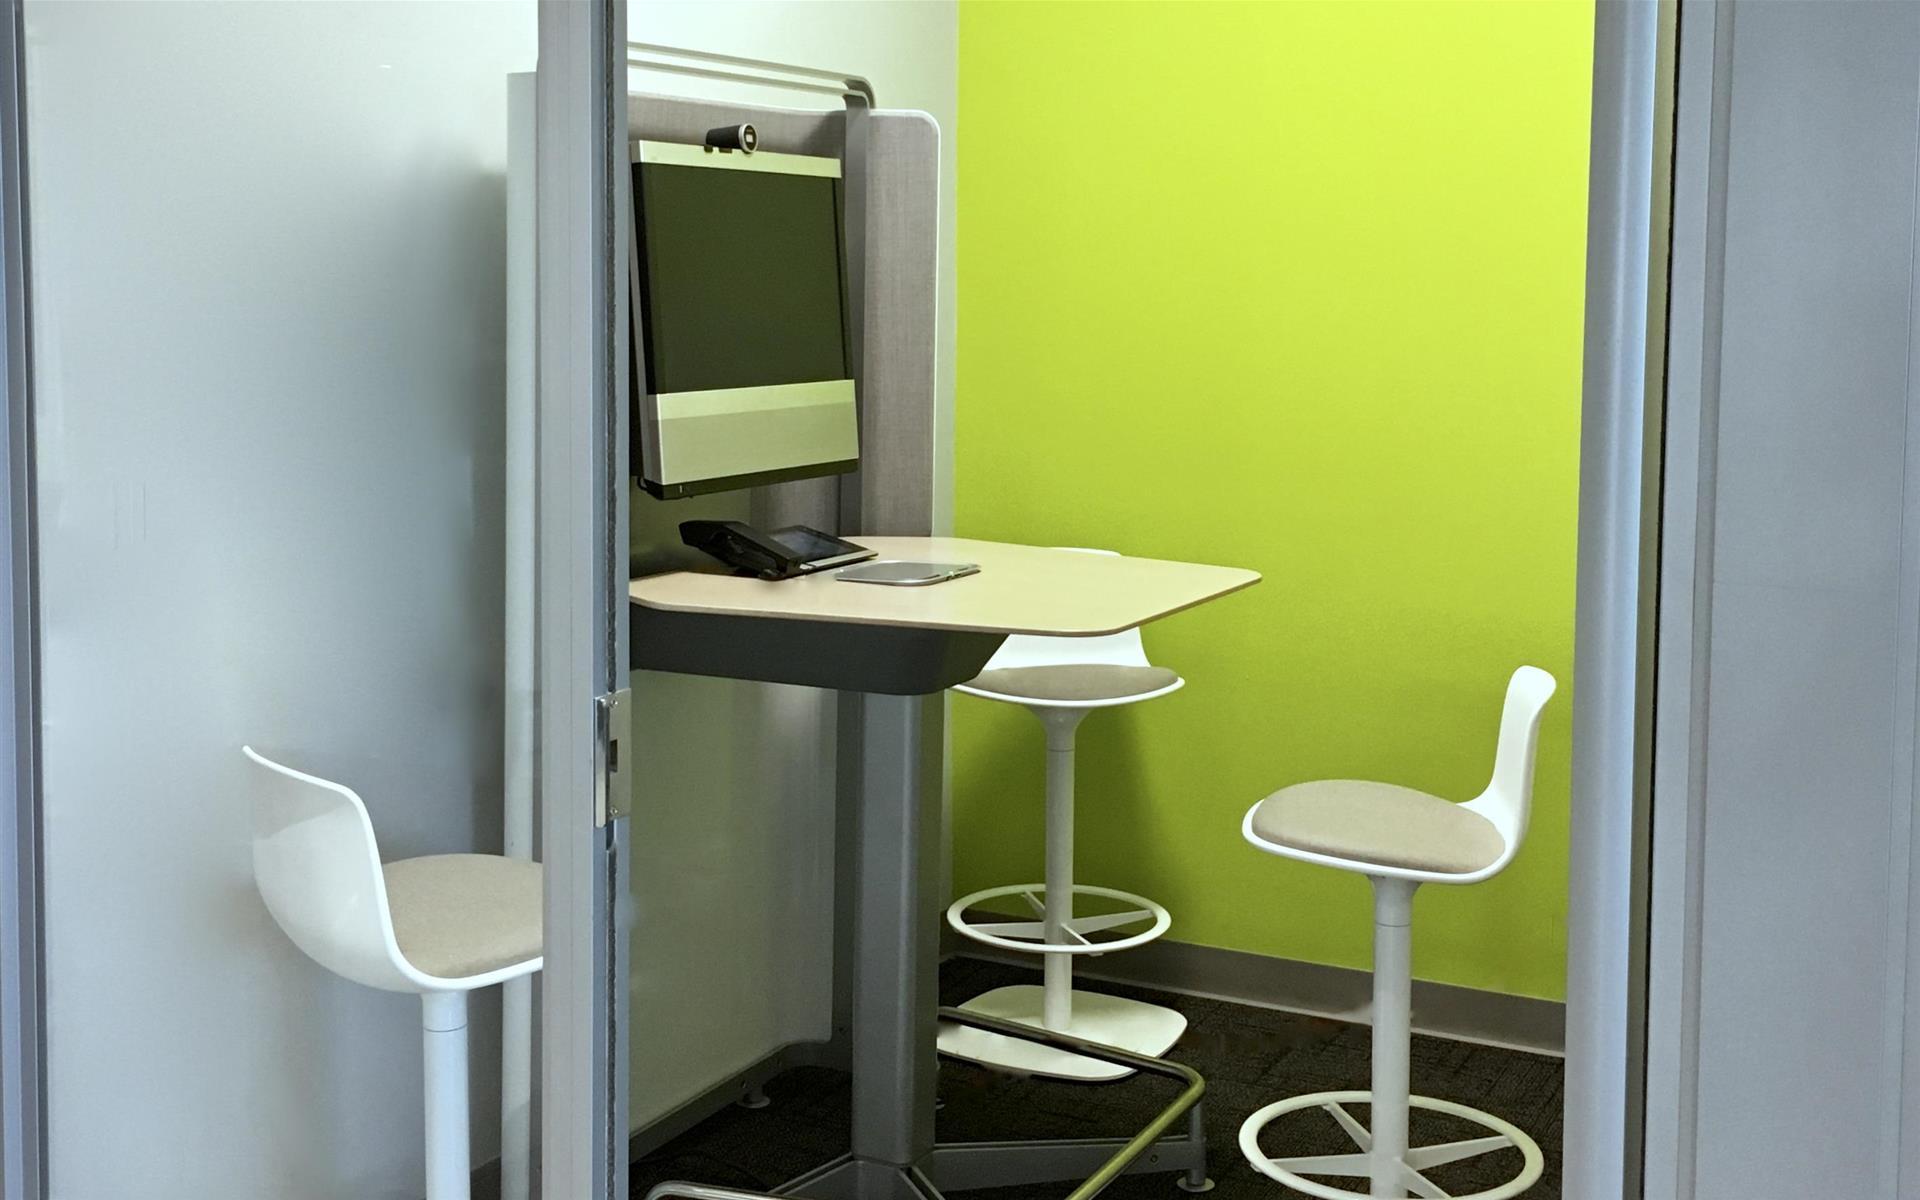 Benjamin's Desk - 30 North 41st Street - Private HD Video Conference Room